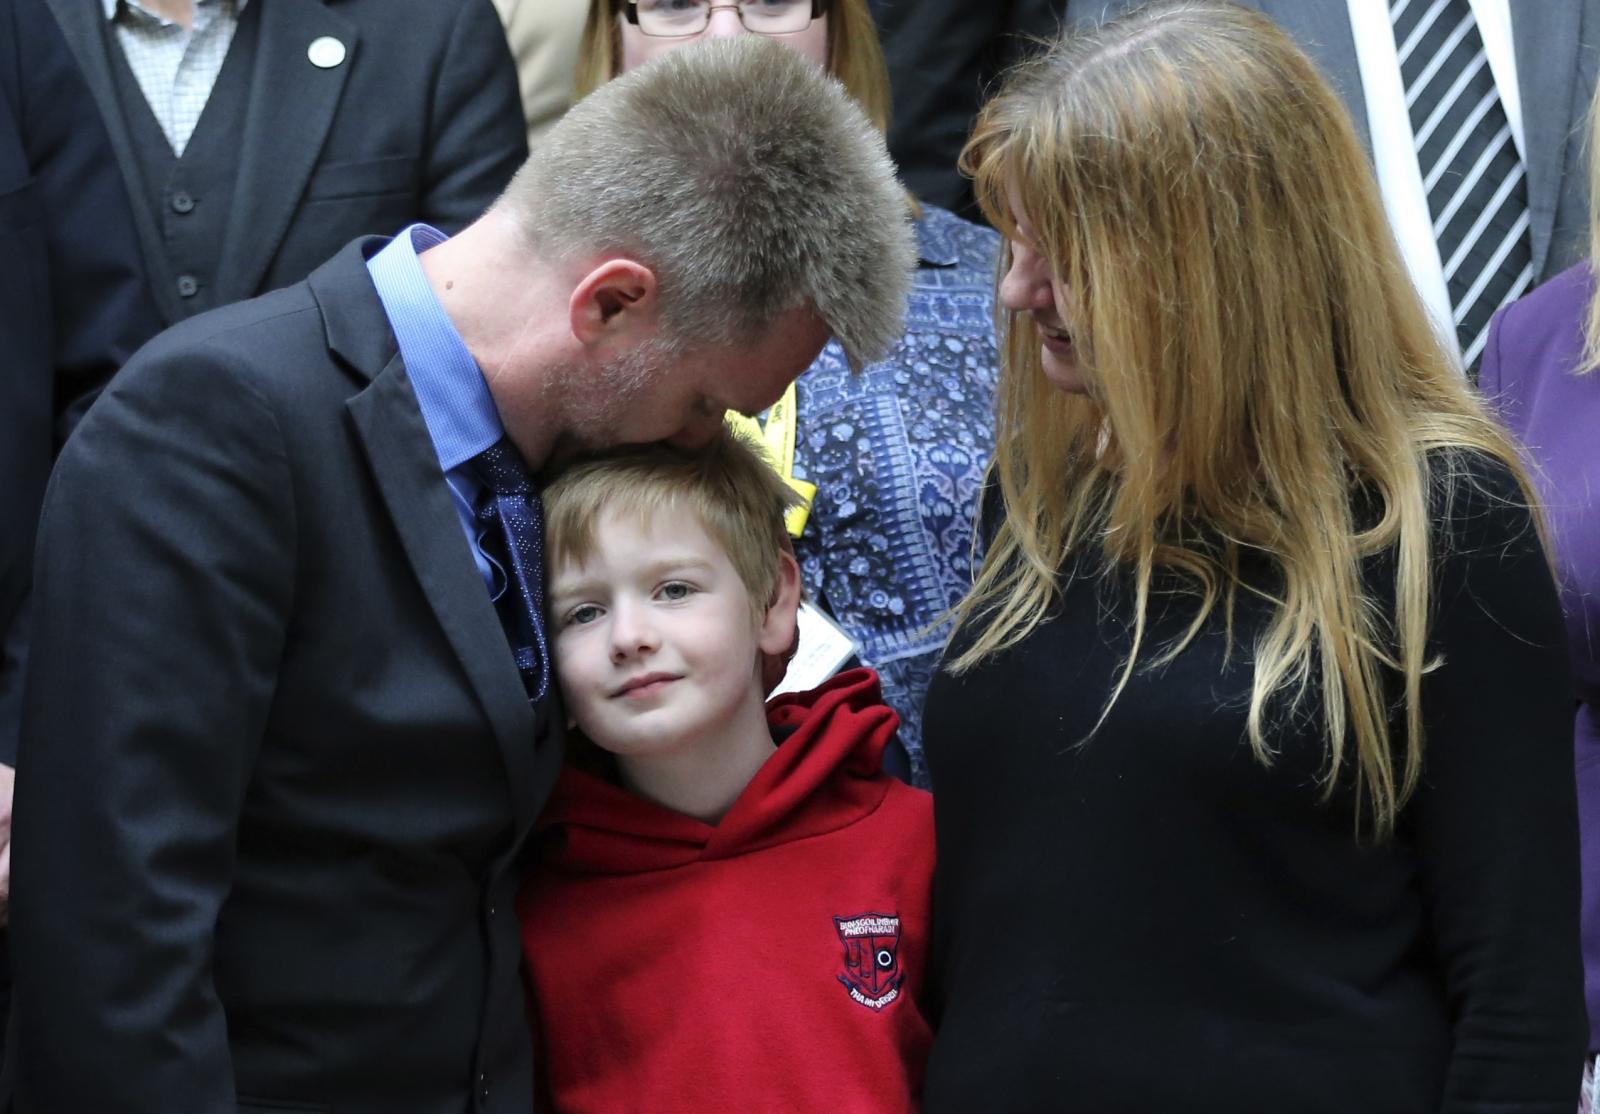 Australian family facing deportation